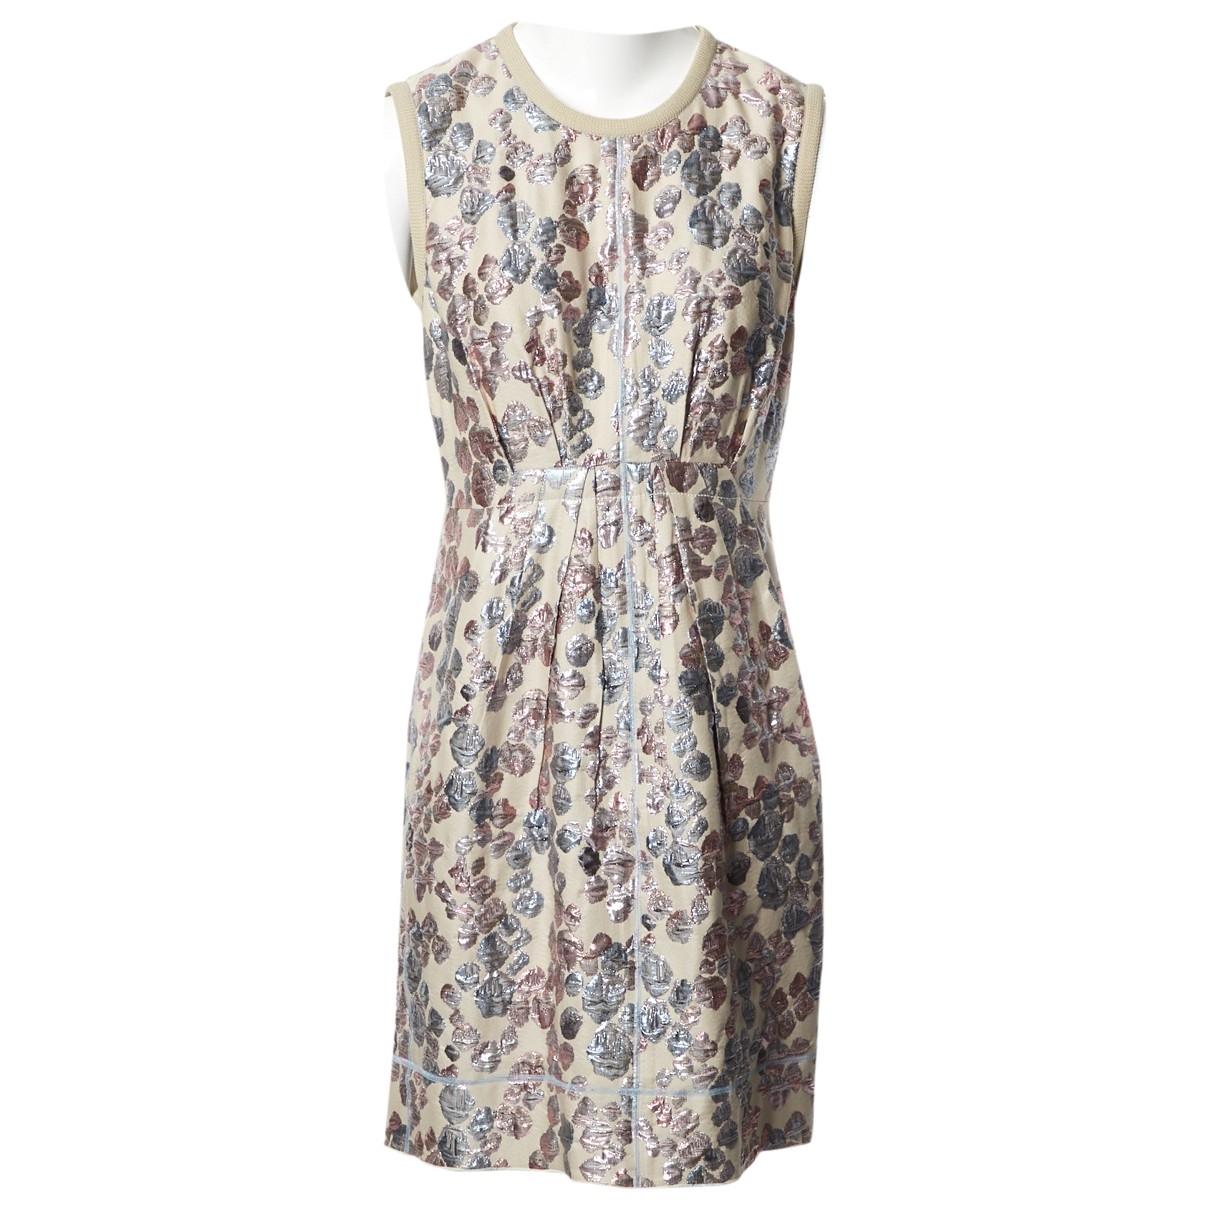 Marc Jacobs \N Ecru Cotton dress for Women 6 US